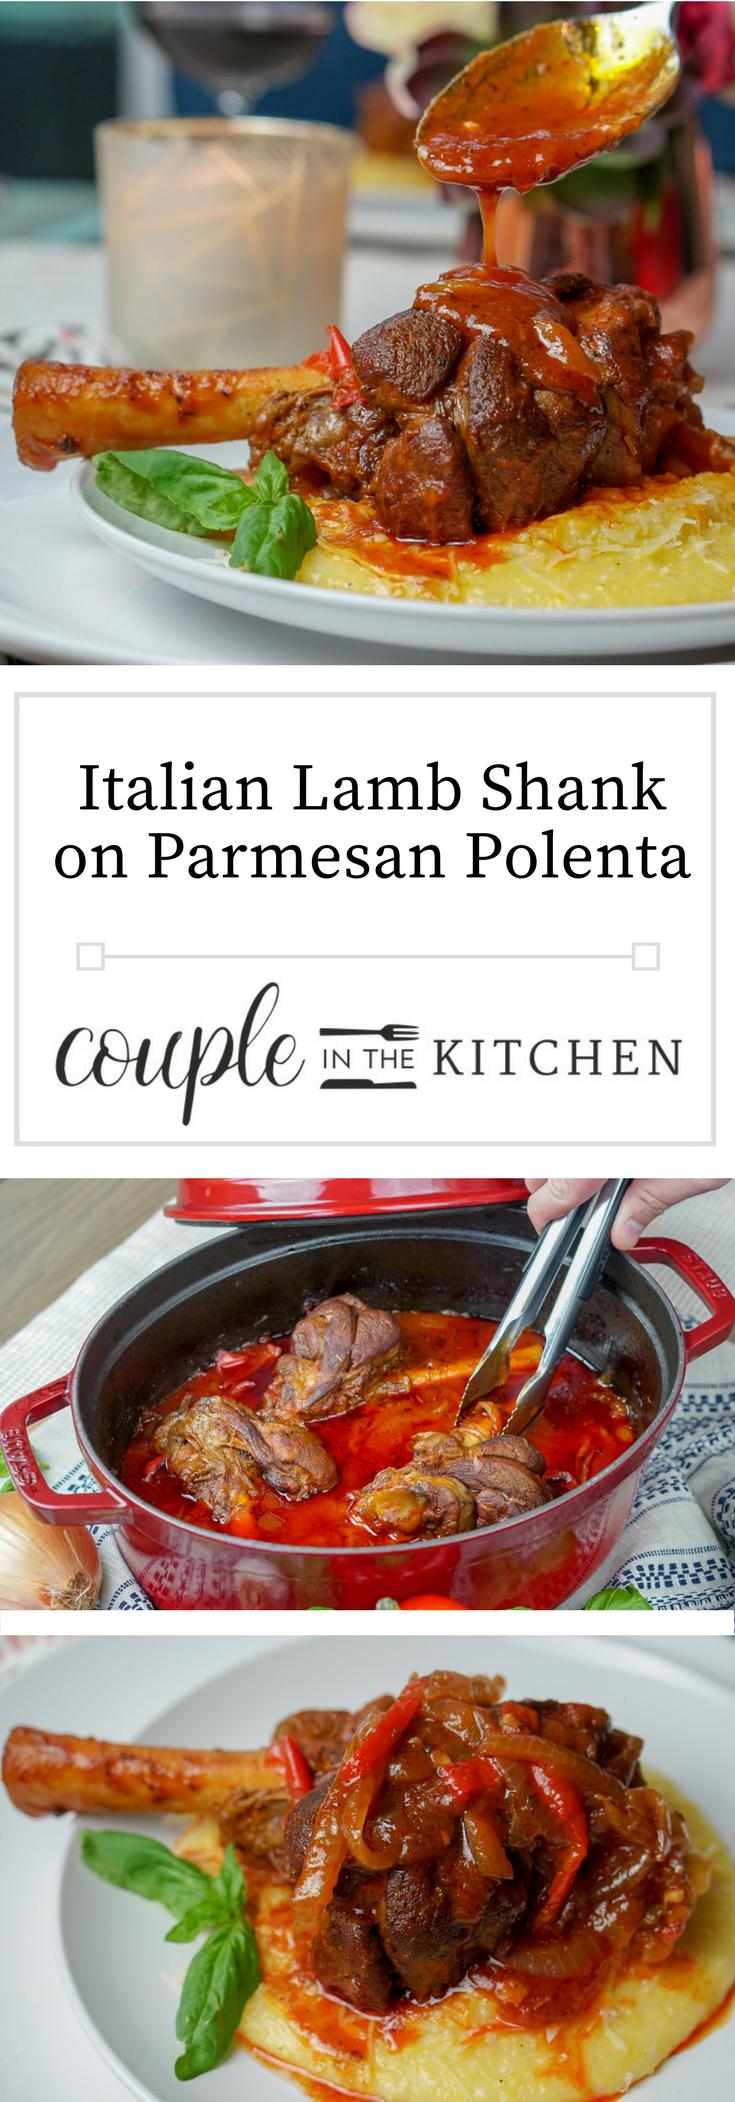 Italian Braised Lamb Shanks with Parmasan Polenta | coupleinthekitchen.com